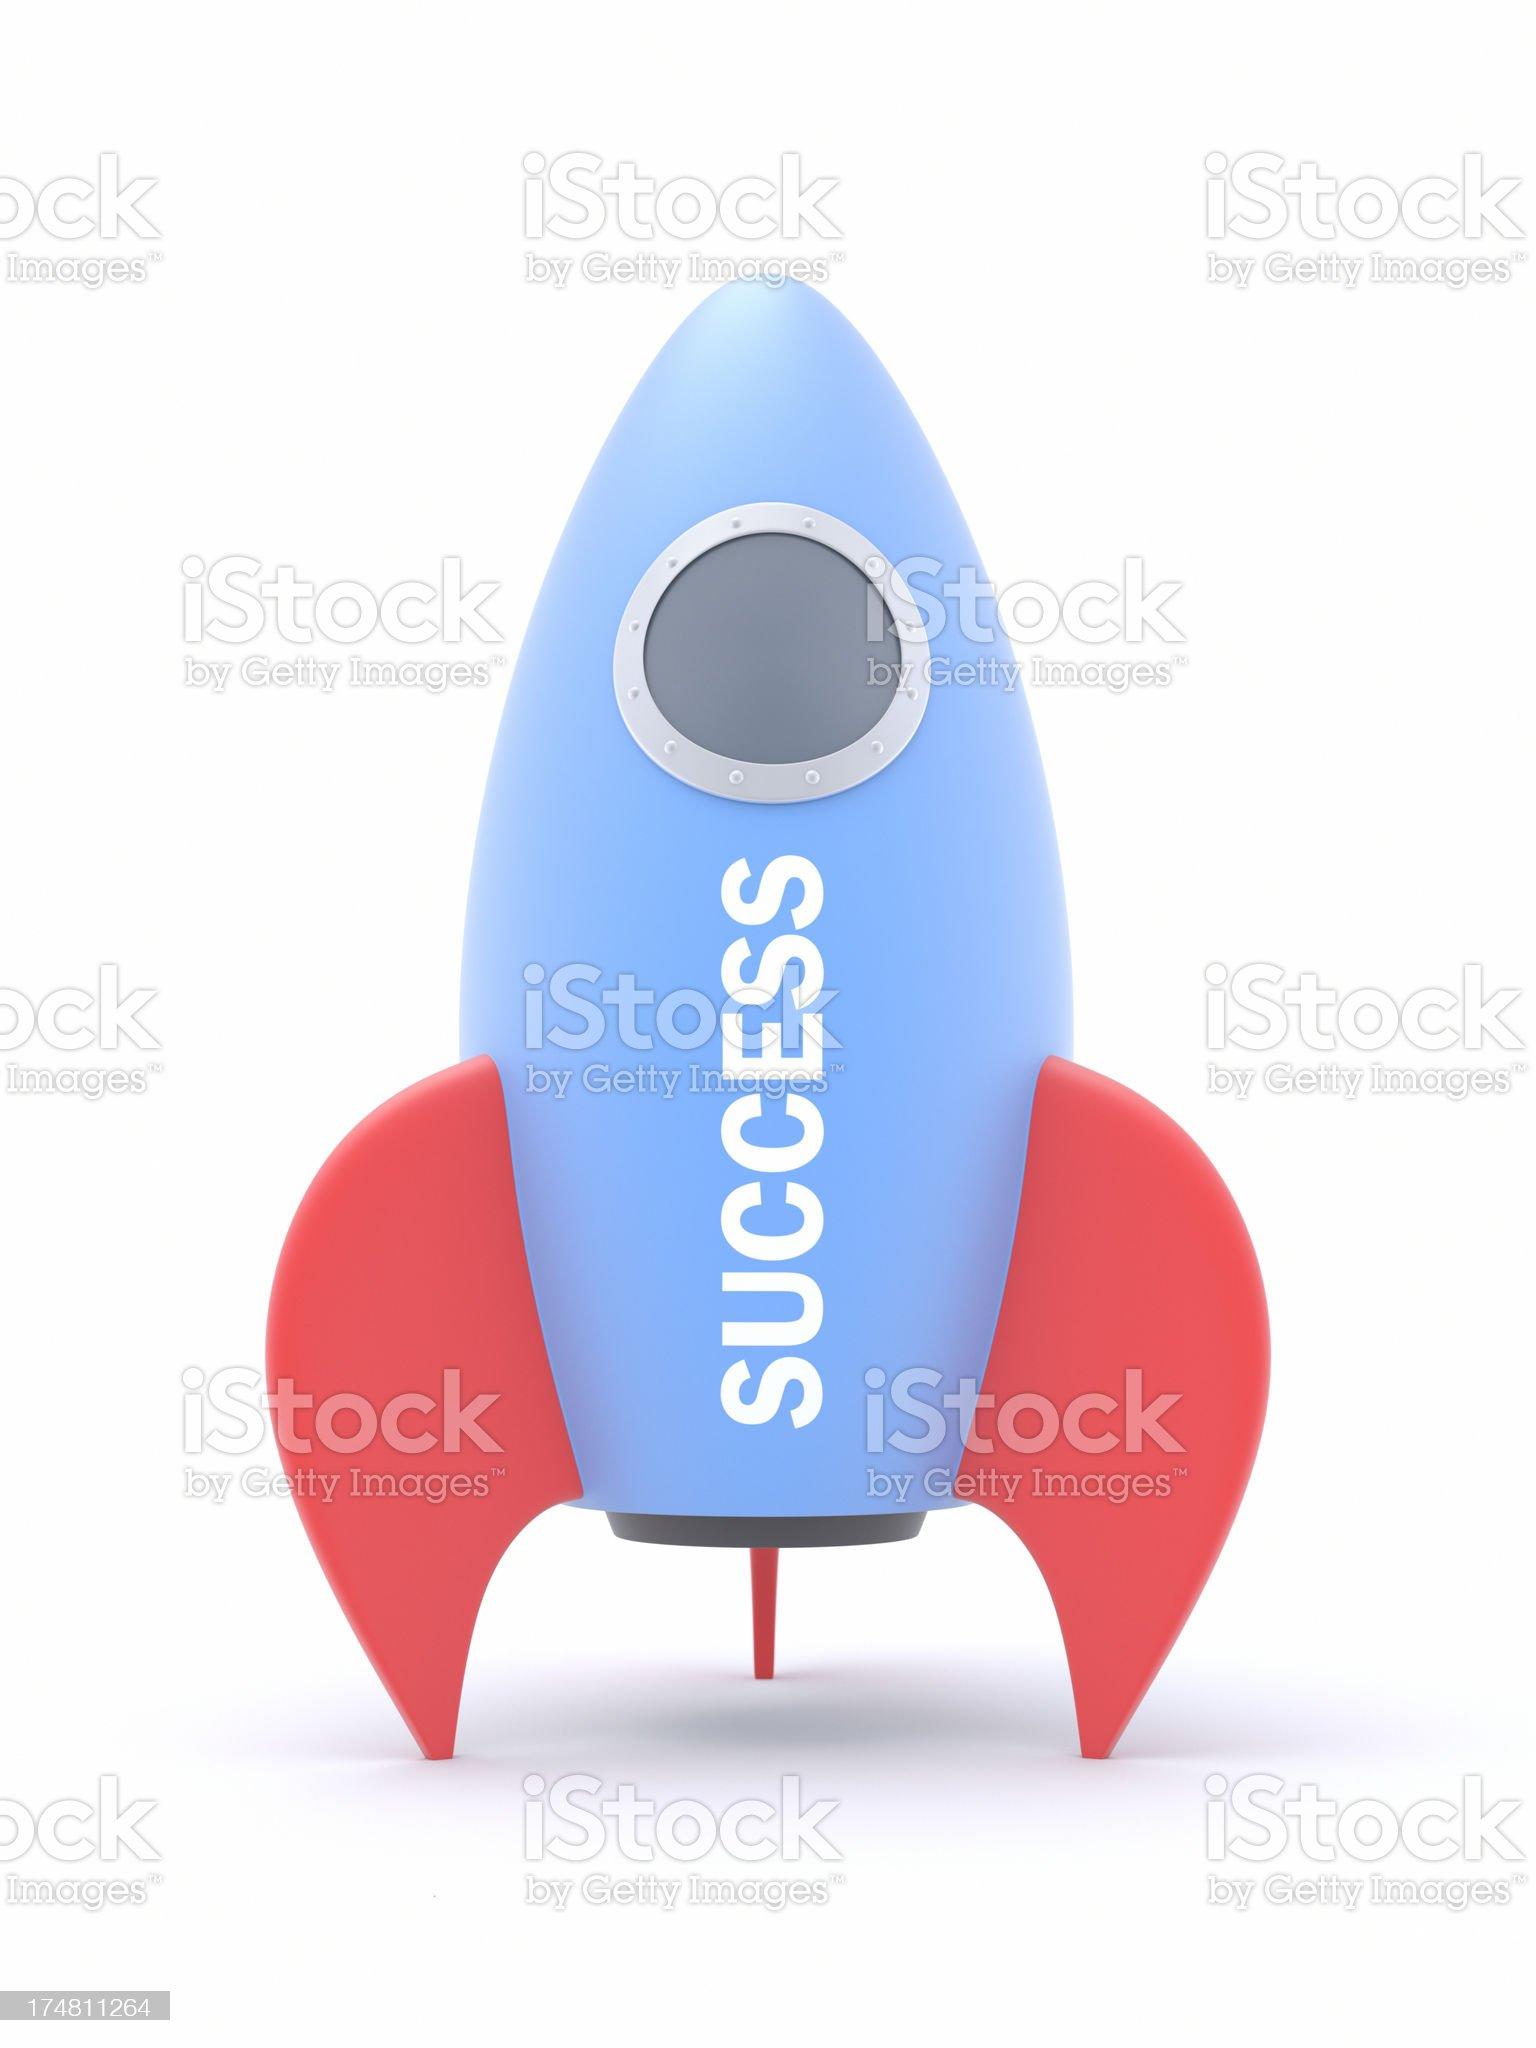 Rocket to Success XL+ royalty-free stock photo